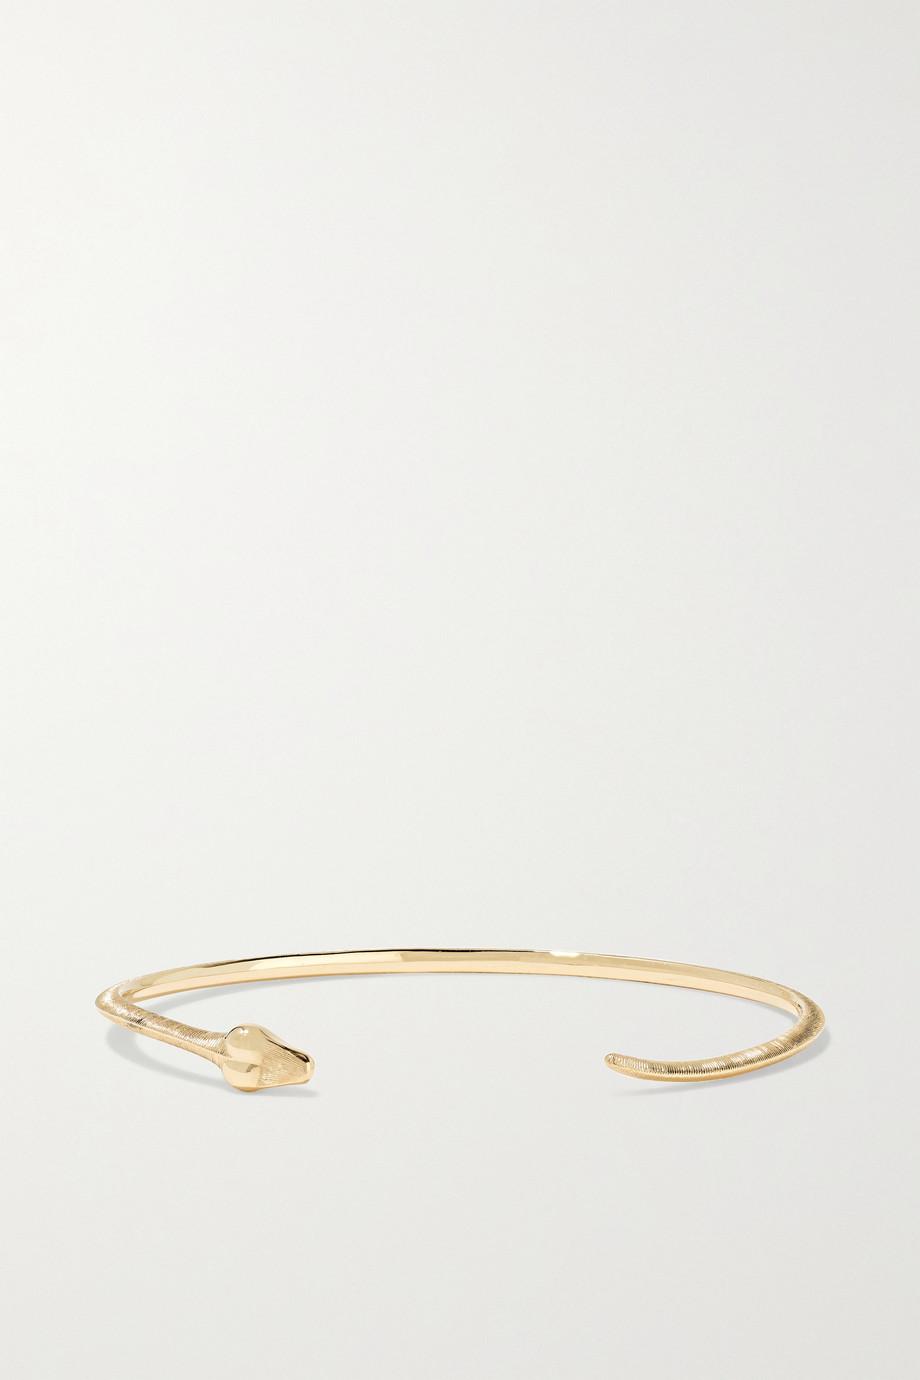 OLE LYNGGAARD COPENHAGEN Snake 18-karat gold cuff